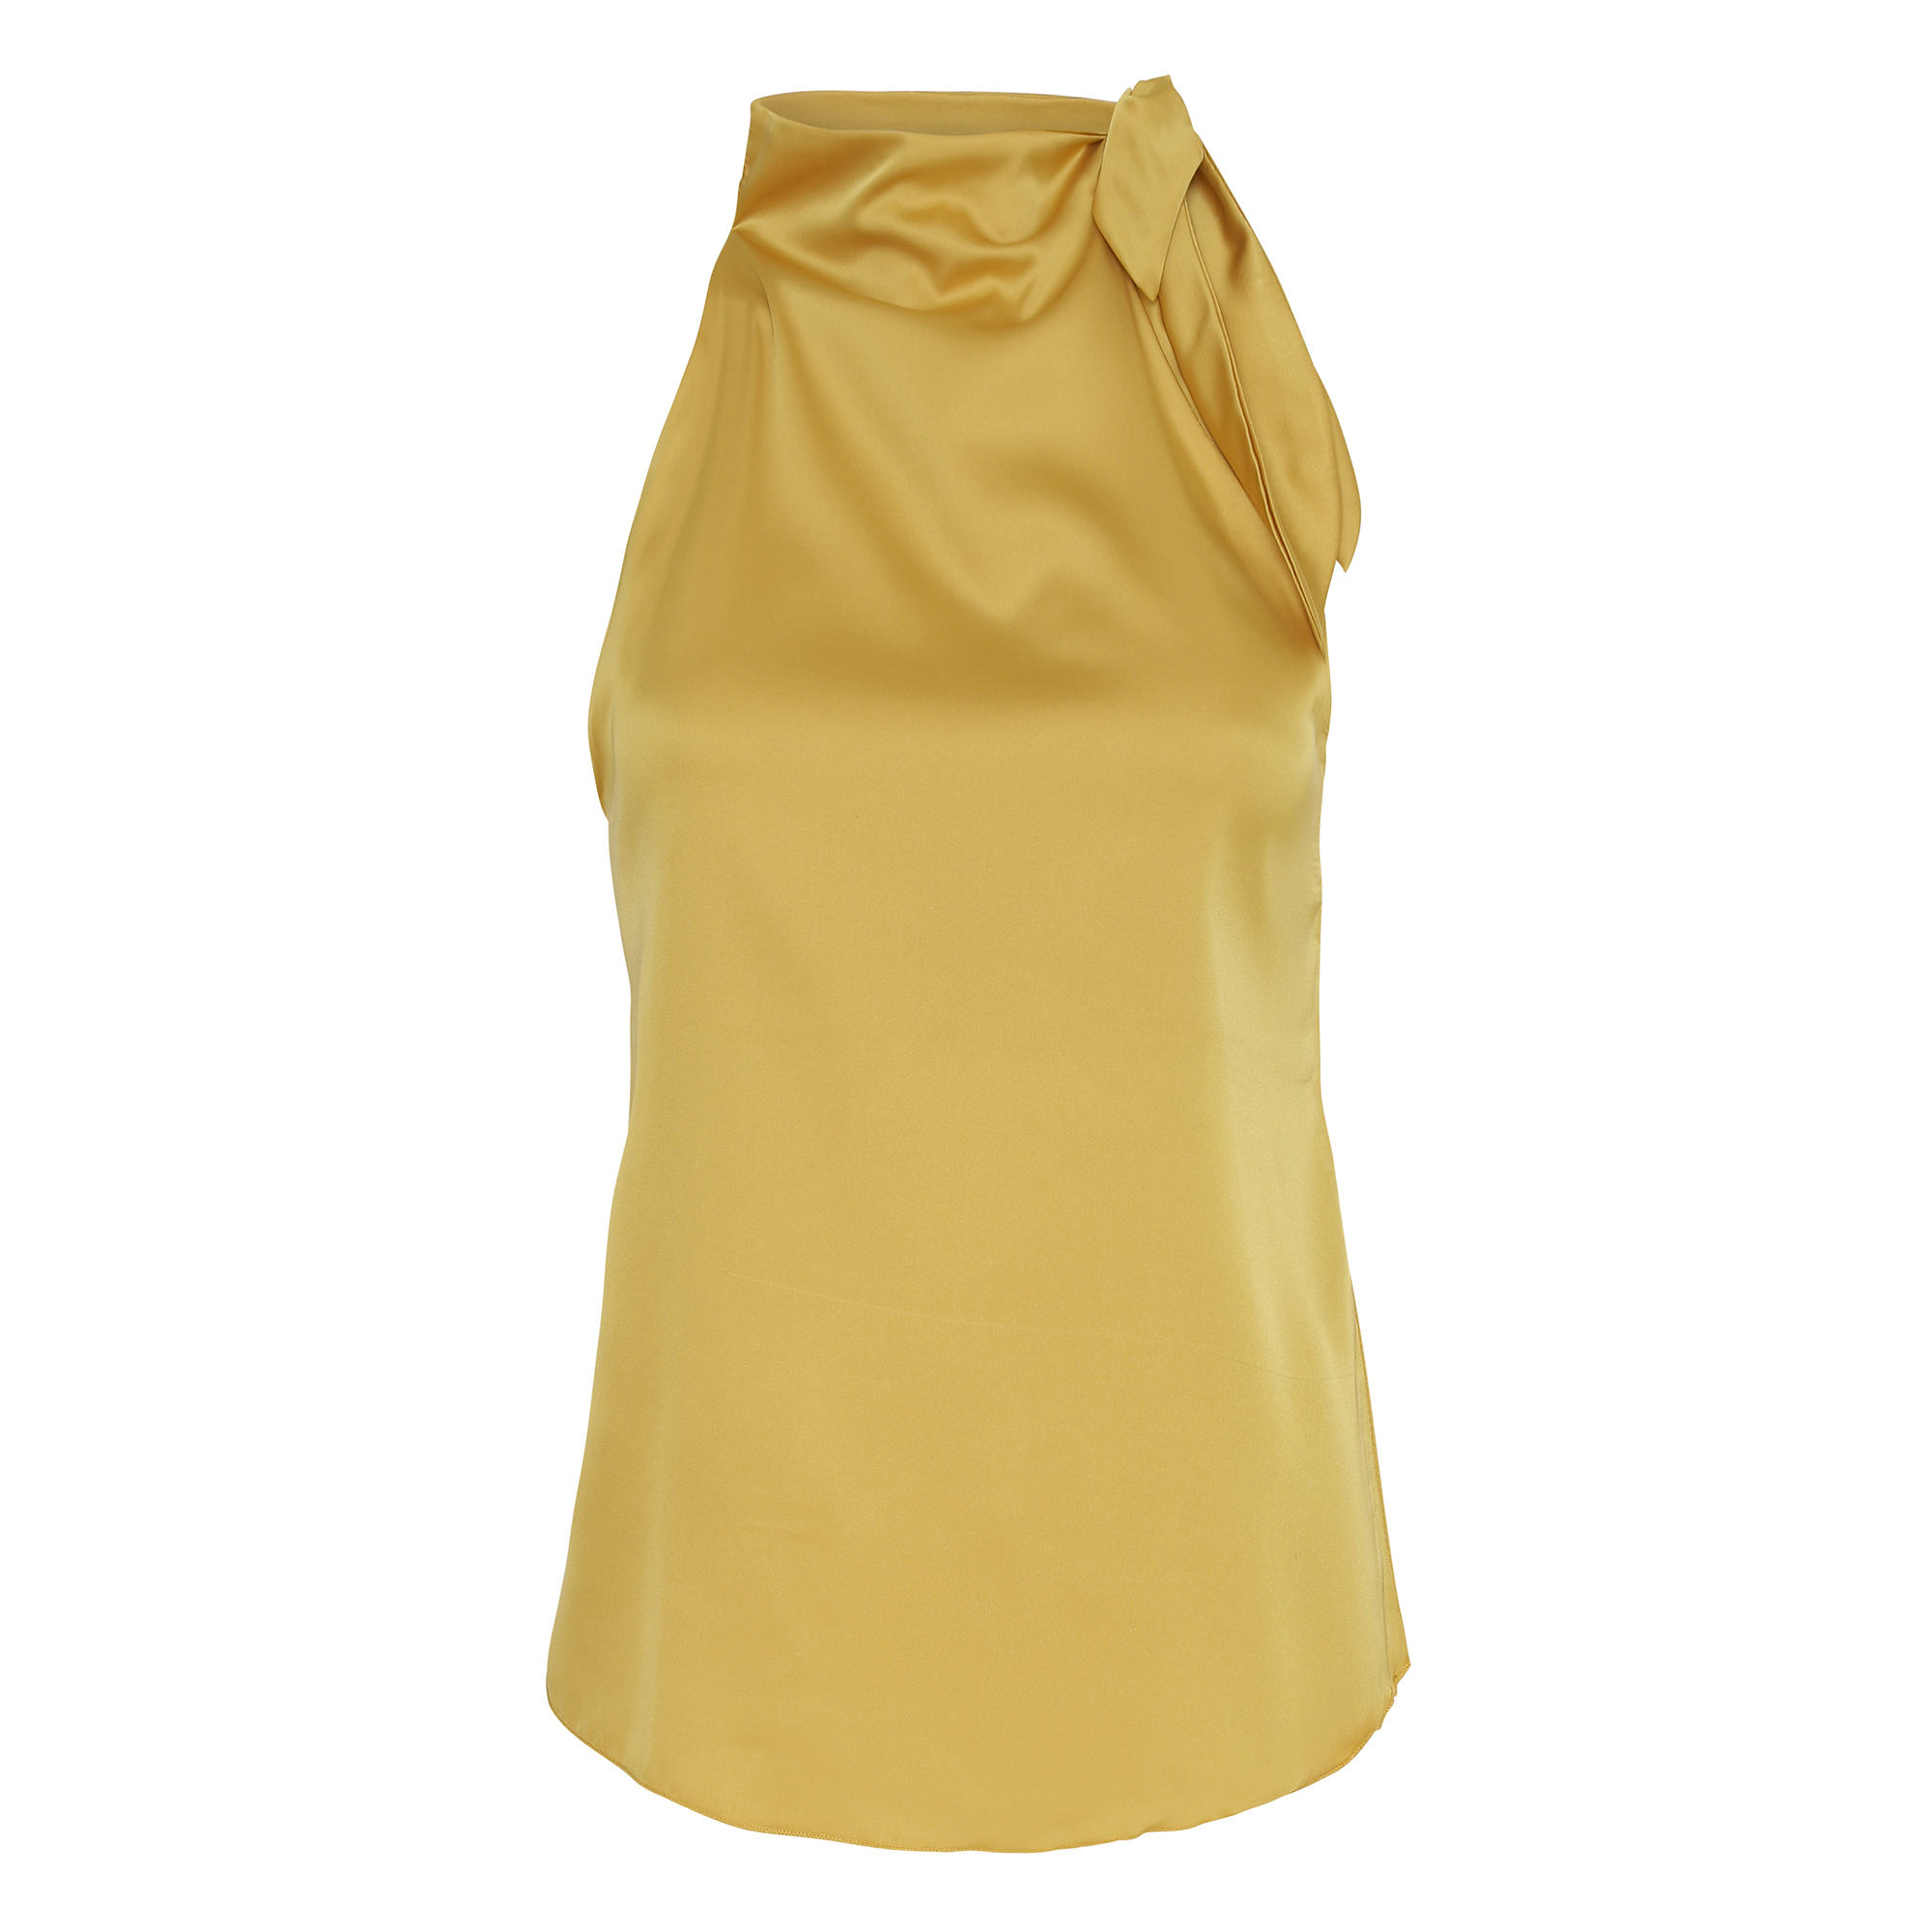 Ribbon-Top-Golden-Yellow KARMAMIA IMAGE  BY ME